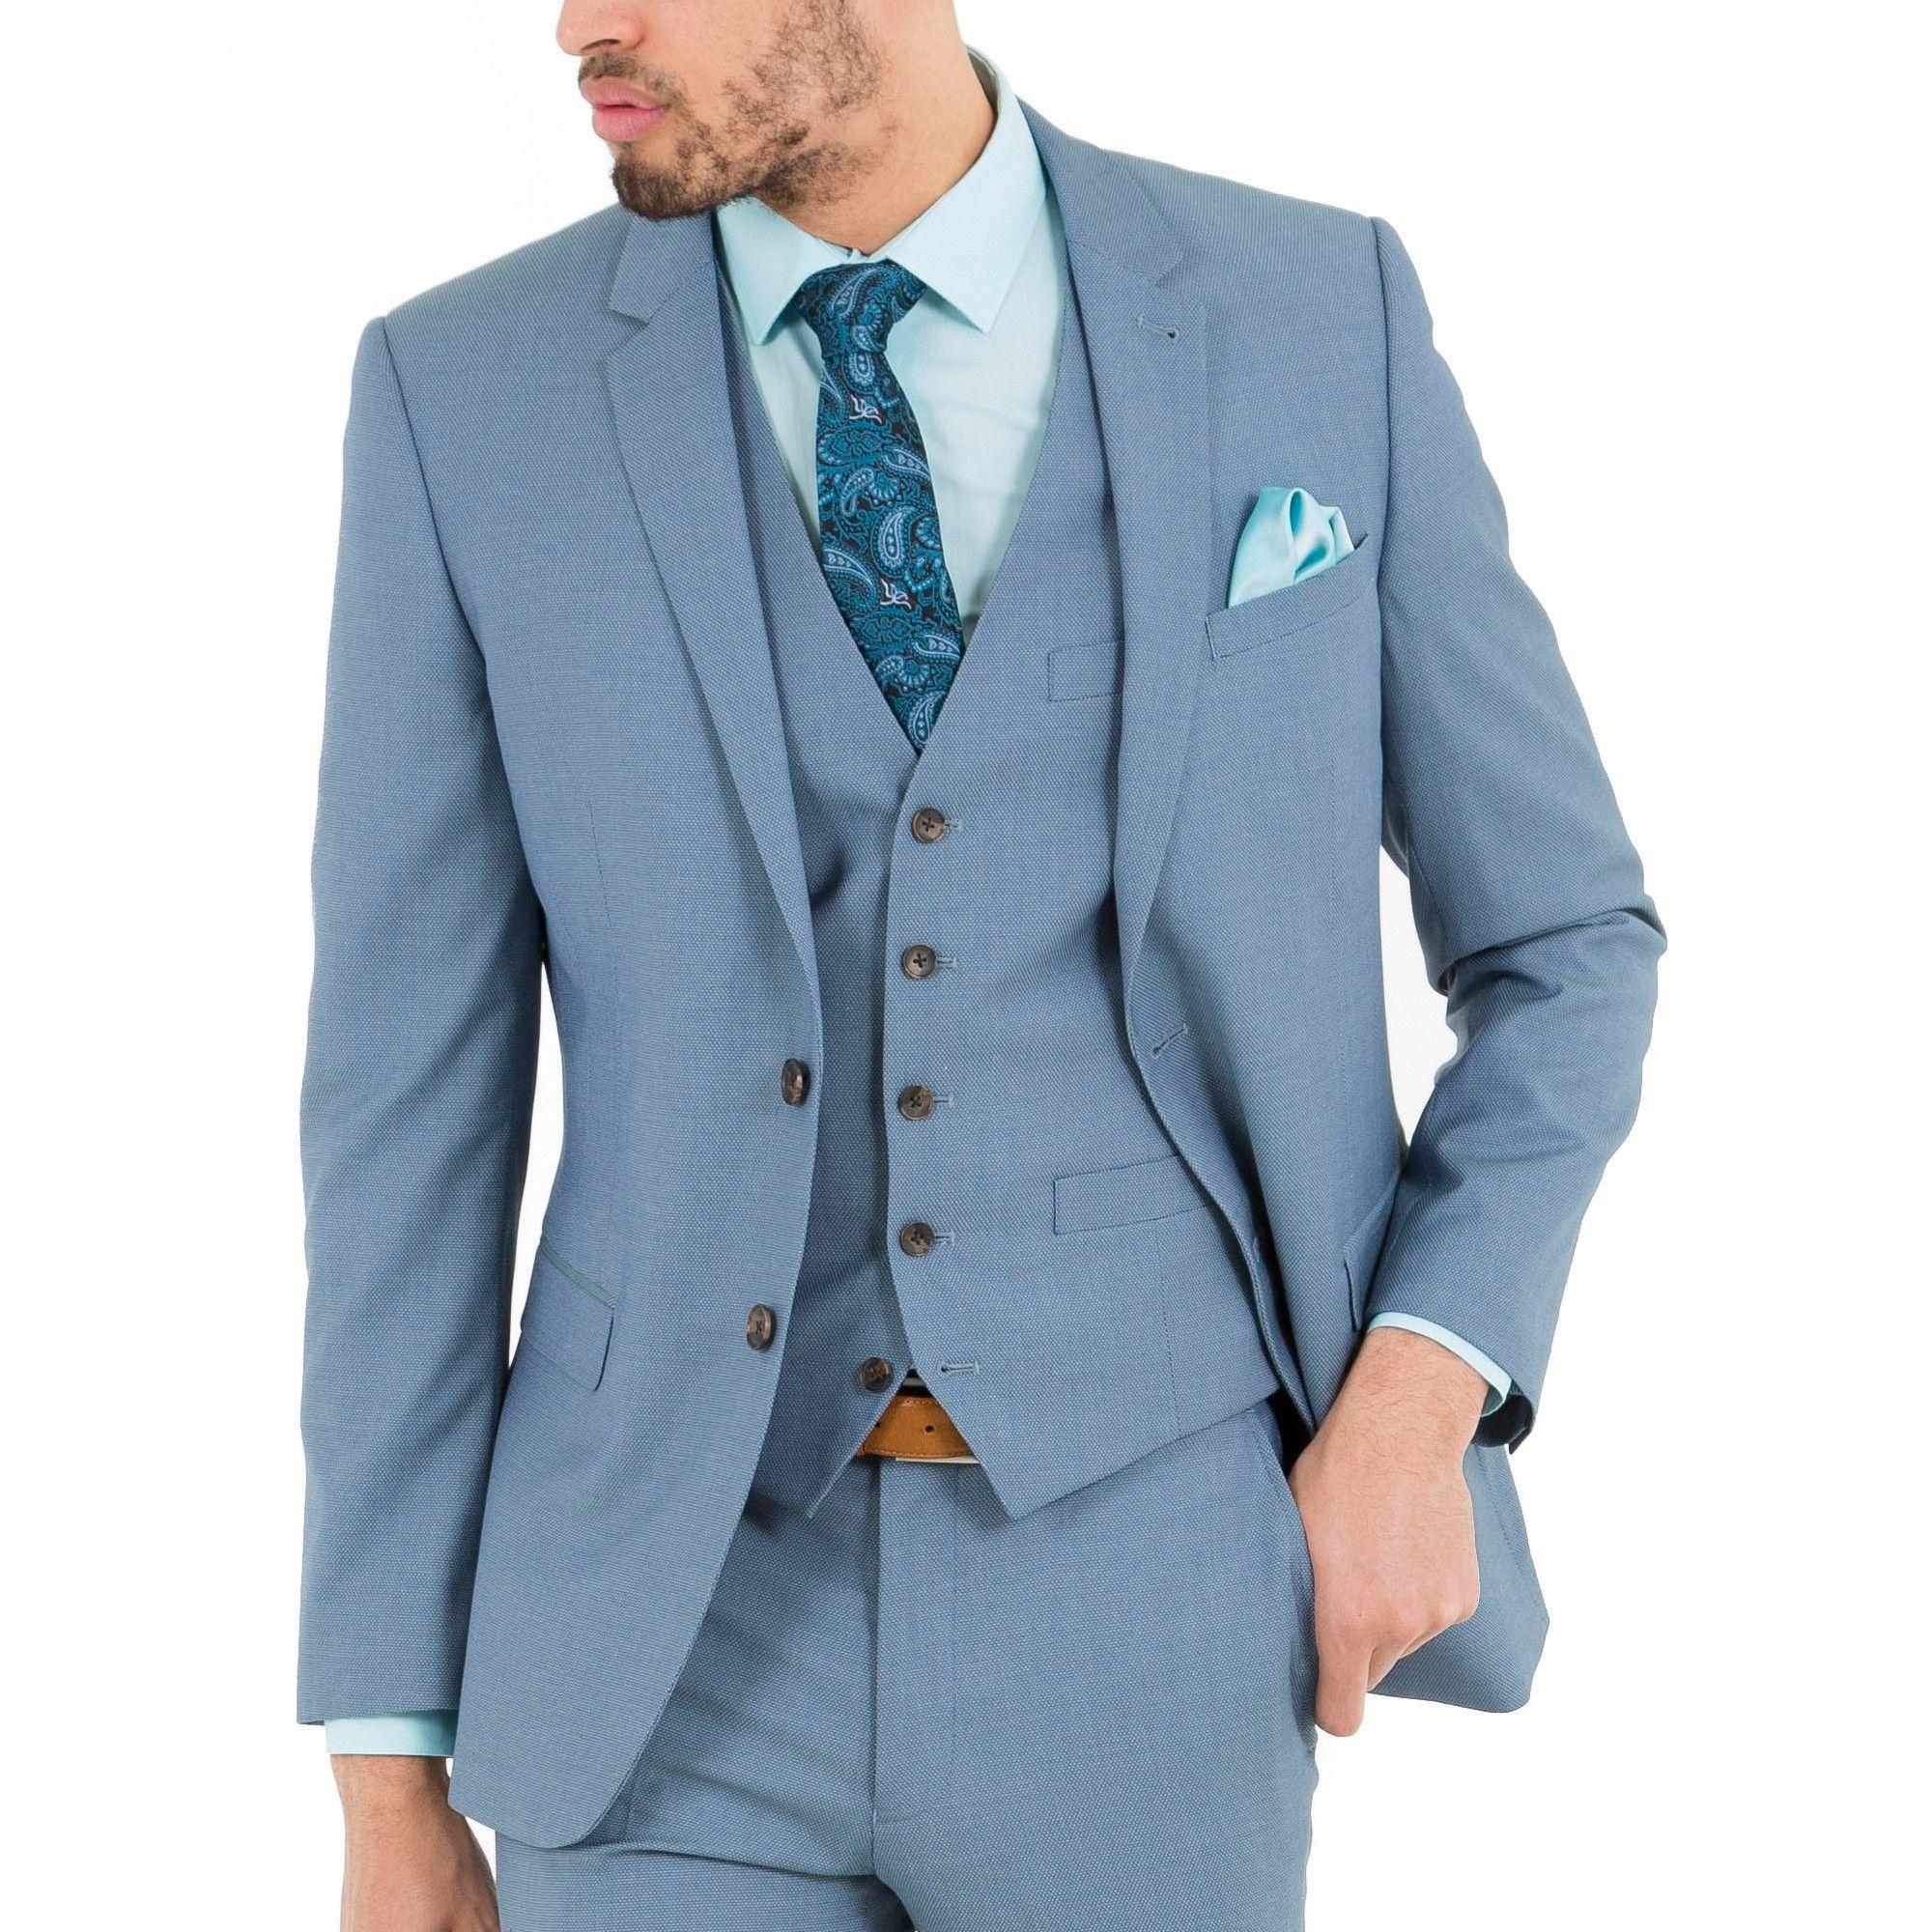 FELLINI TAILORED Light Blue Plain Tailored Three Piece ...